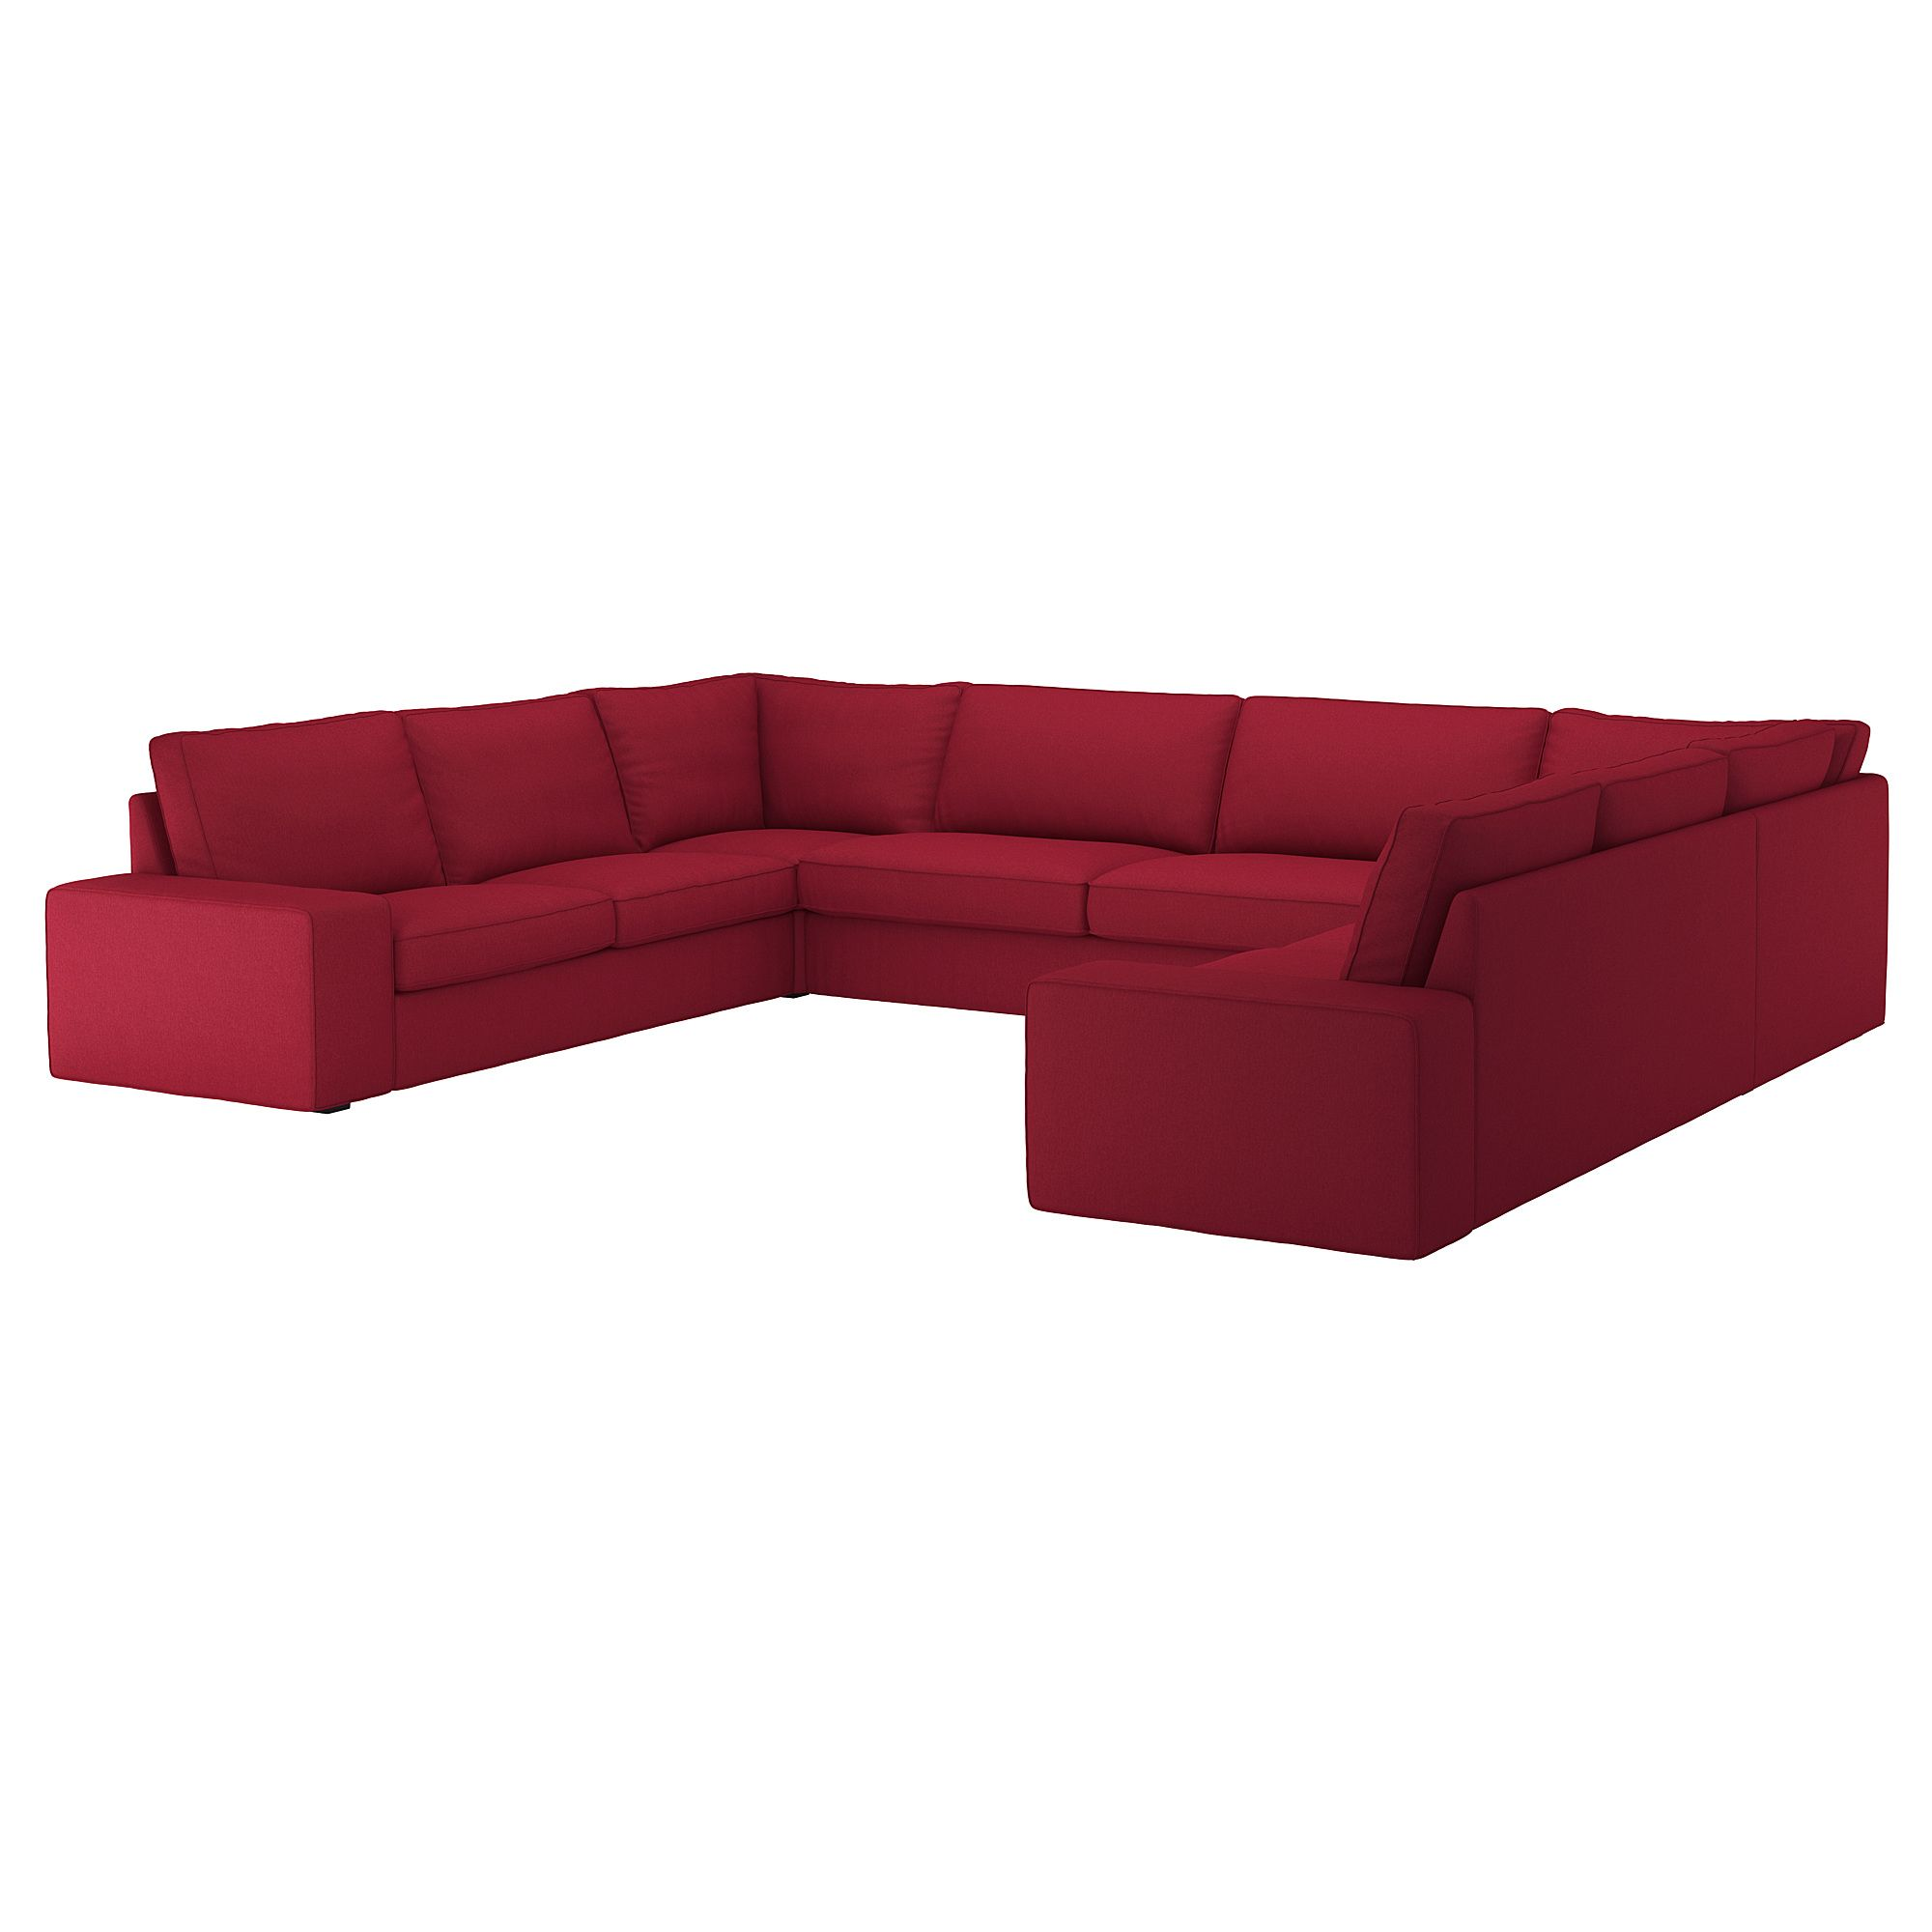 Kivik Sectional 6 Seat Orrsta Red U Shaped Sofa